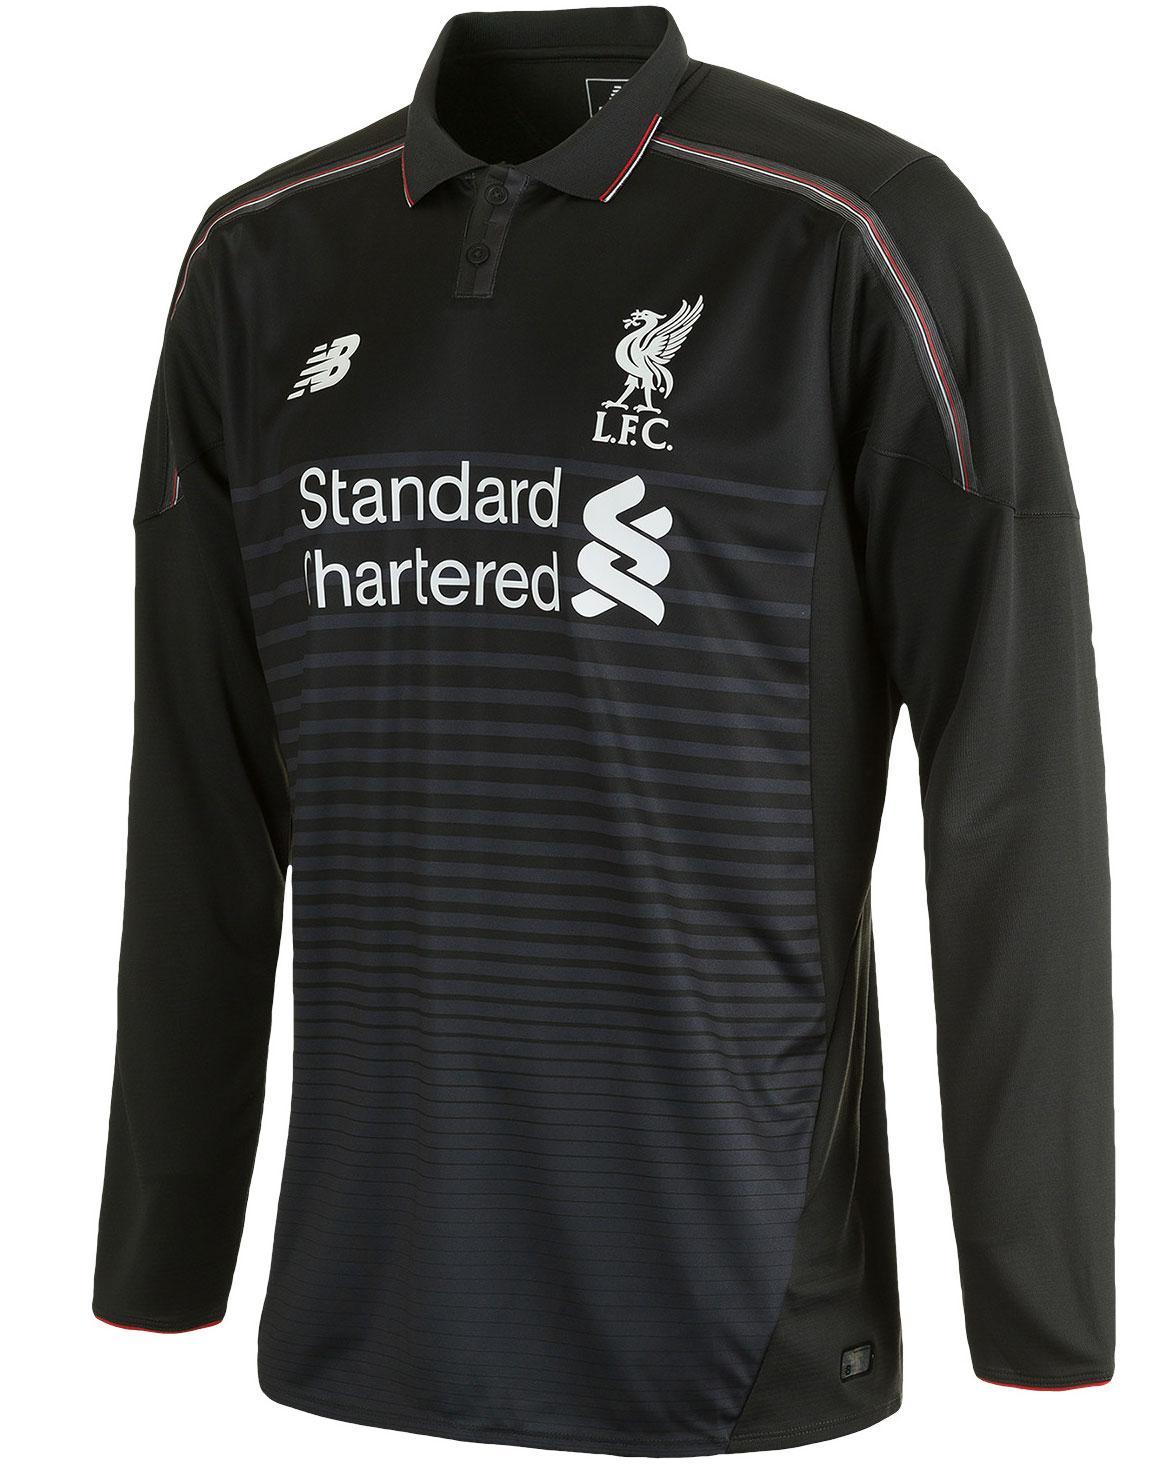 Liverpool 3:e Tröja 2015/16 L/Ä Barn